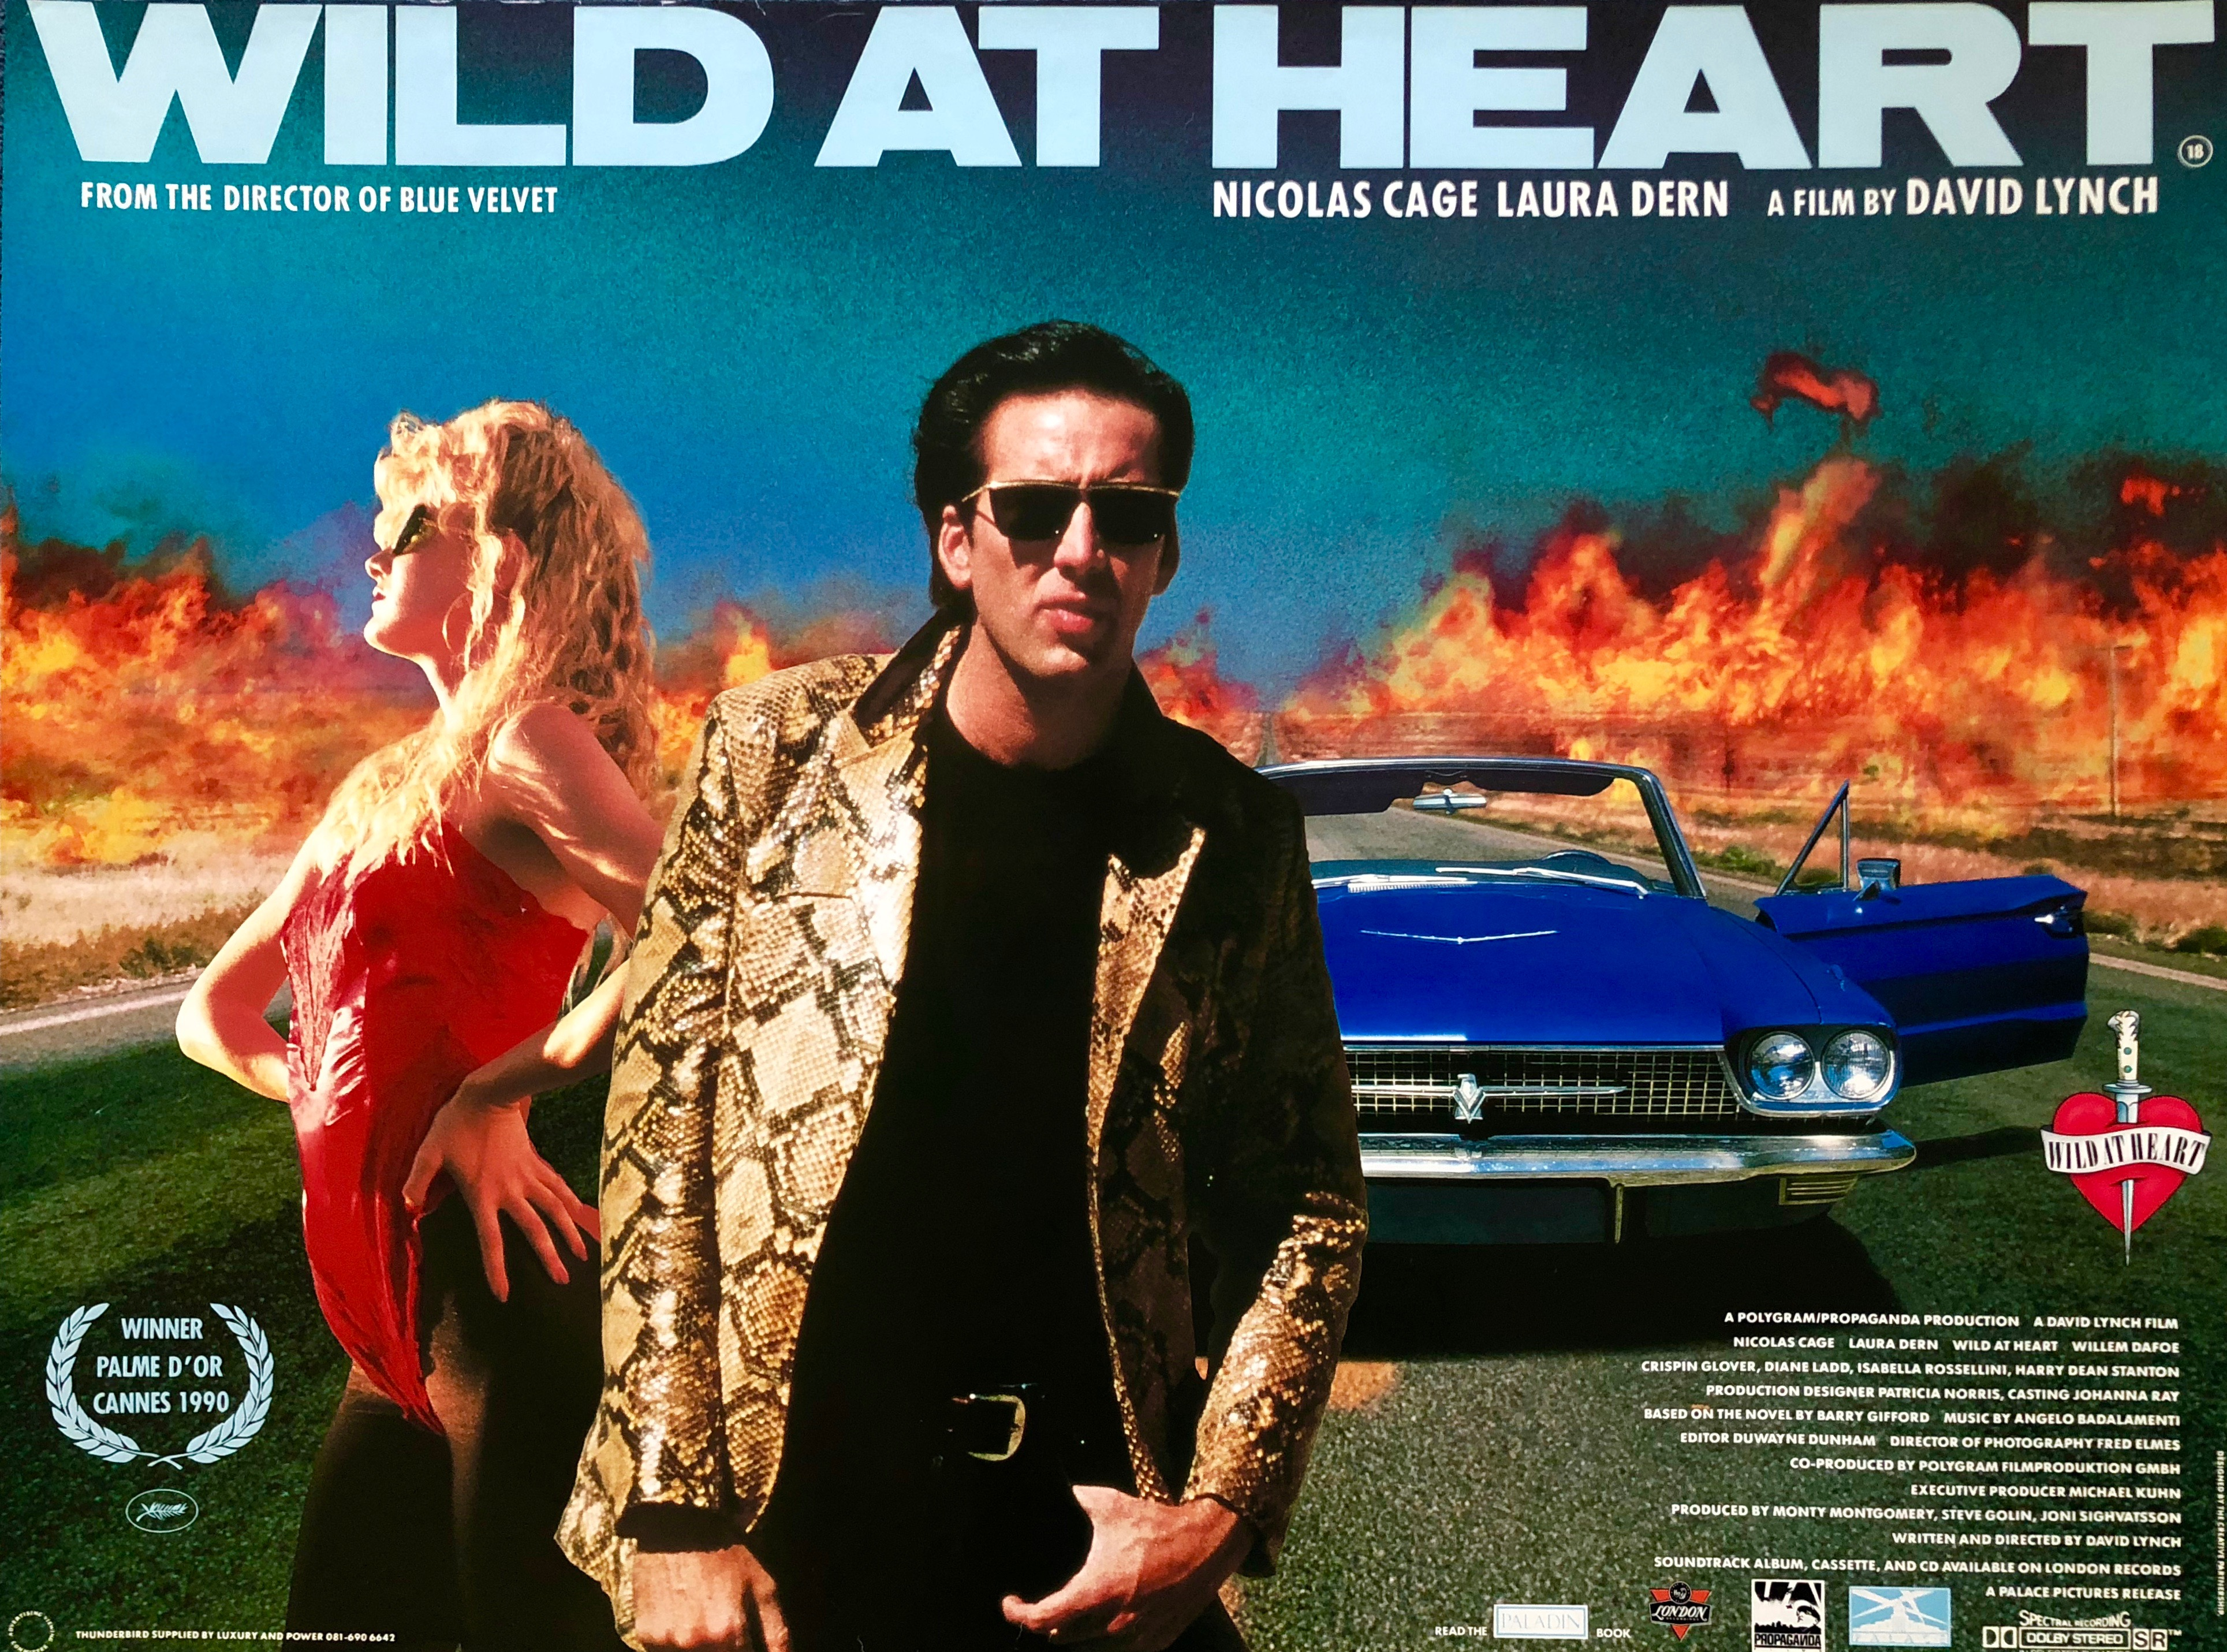 Original Wild at Heart Movie Poster - David Lynch - Nicolas Cage